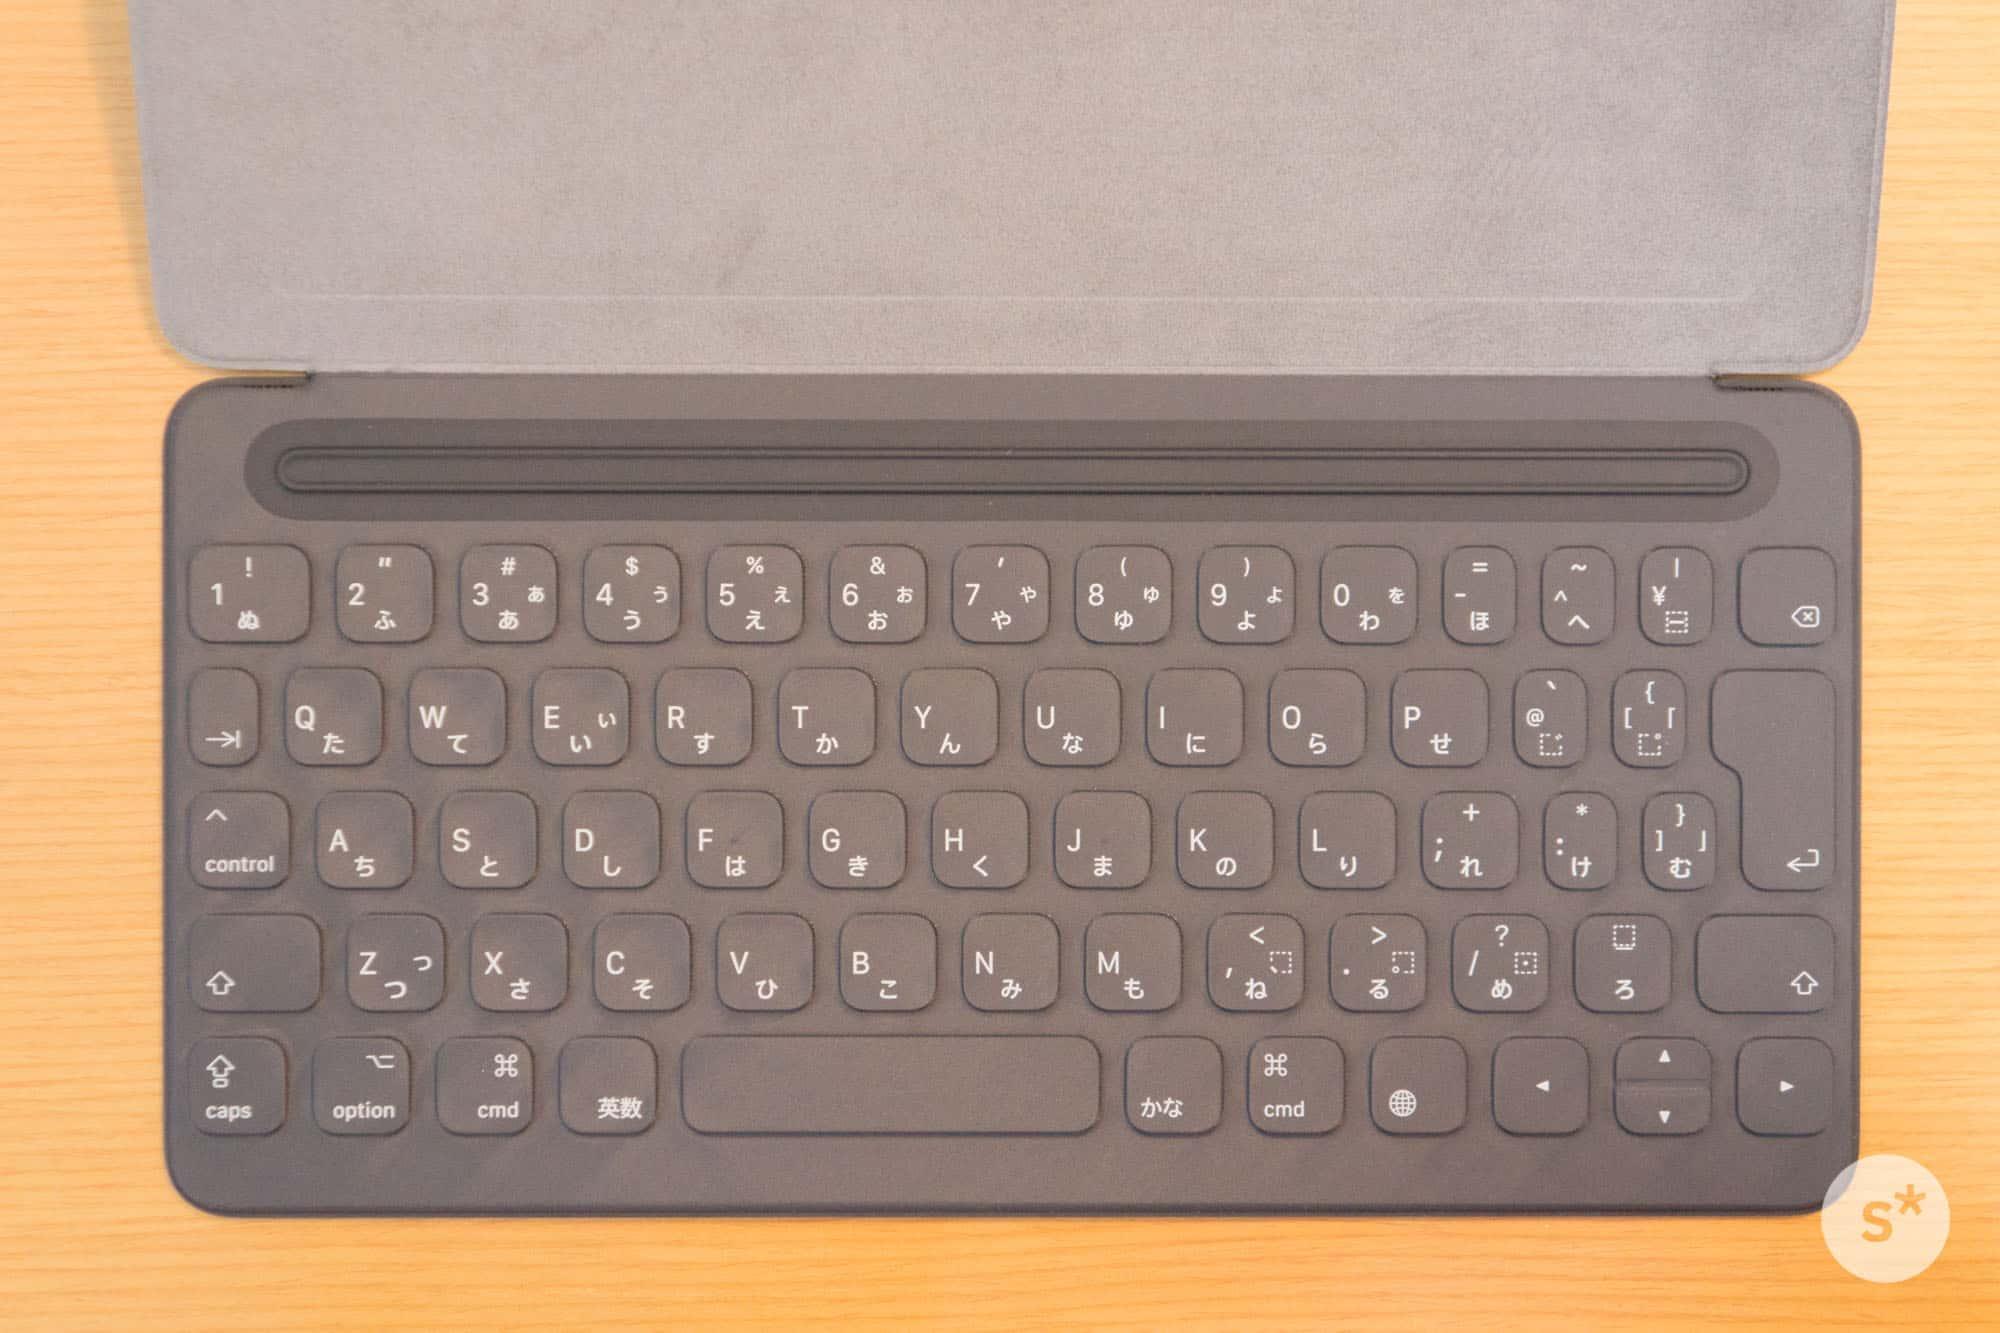 jis-keyboard